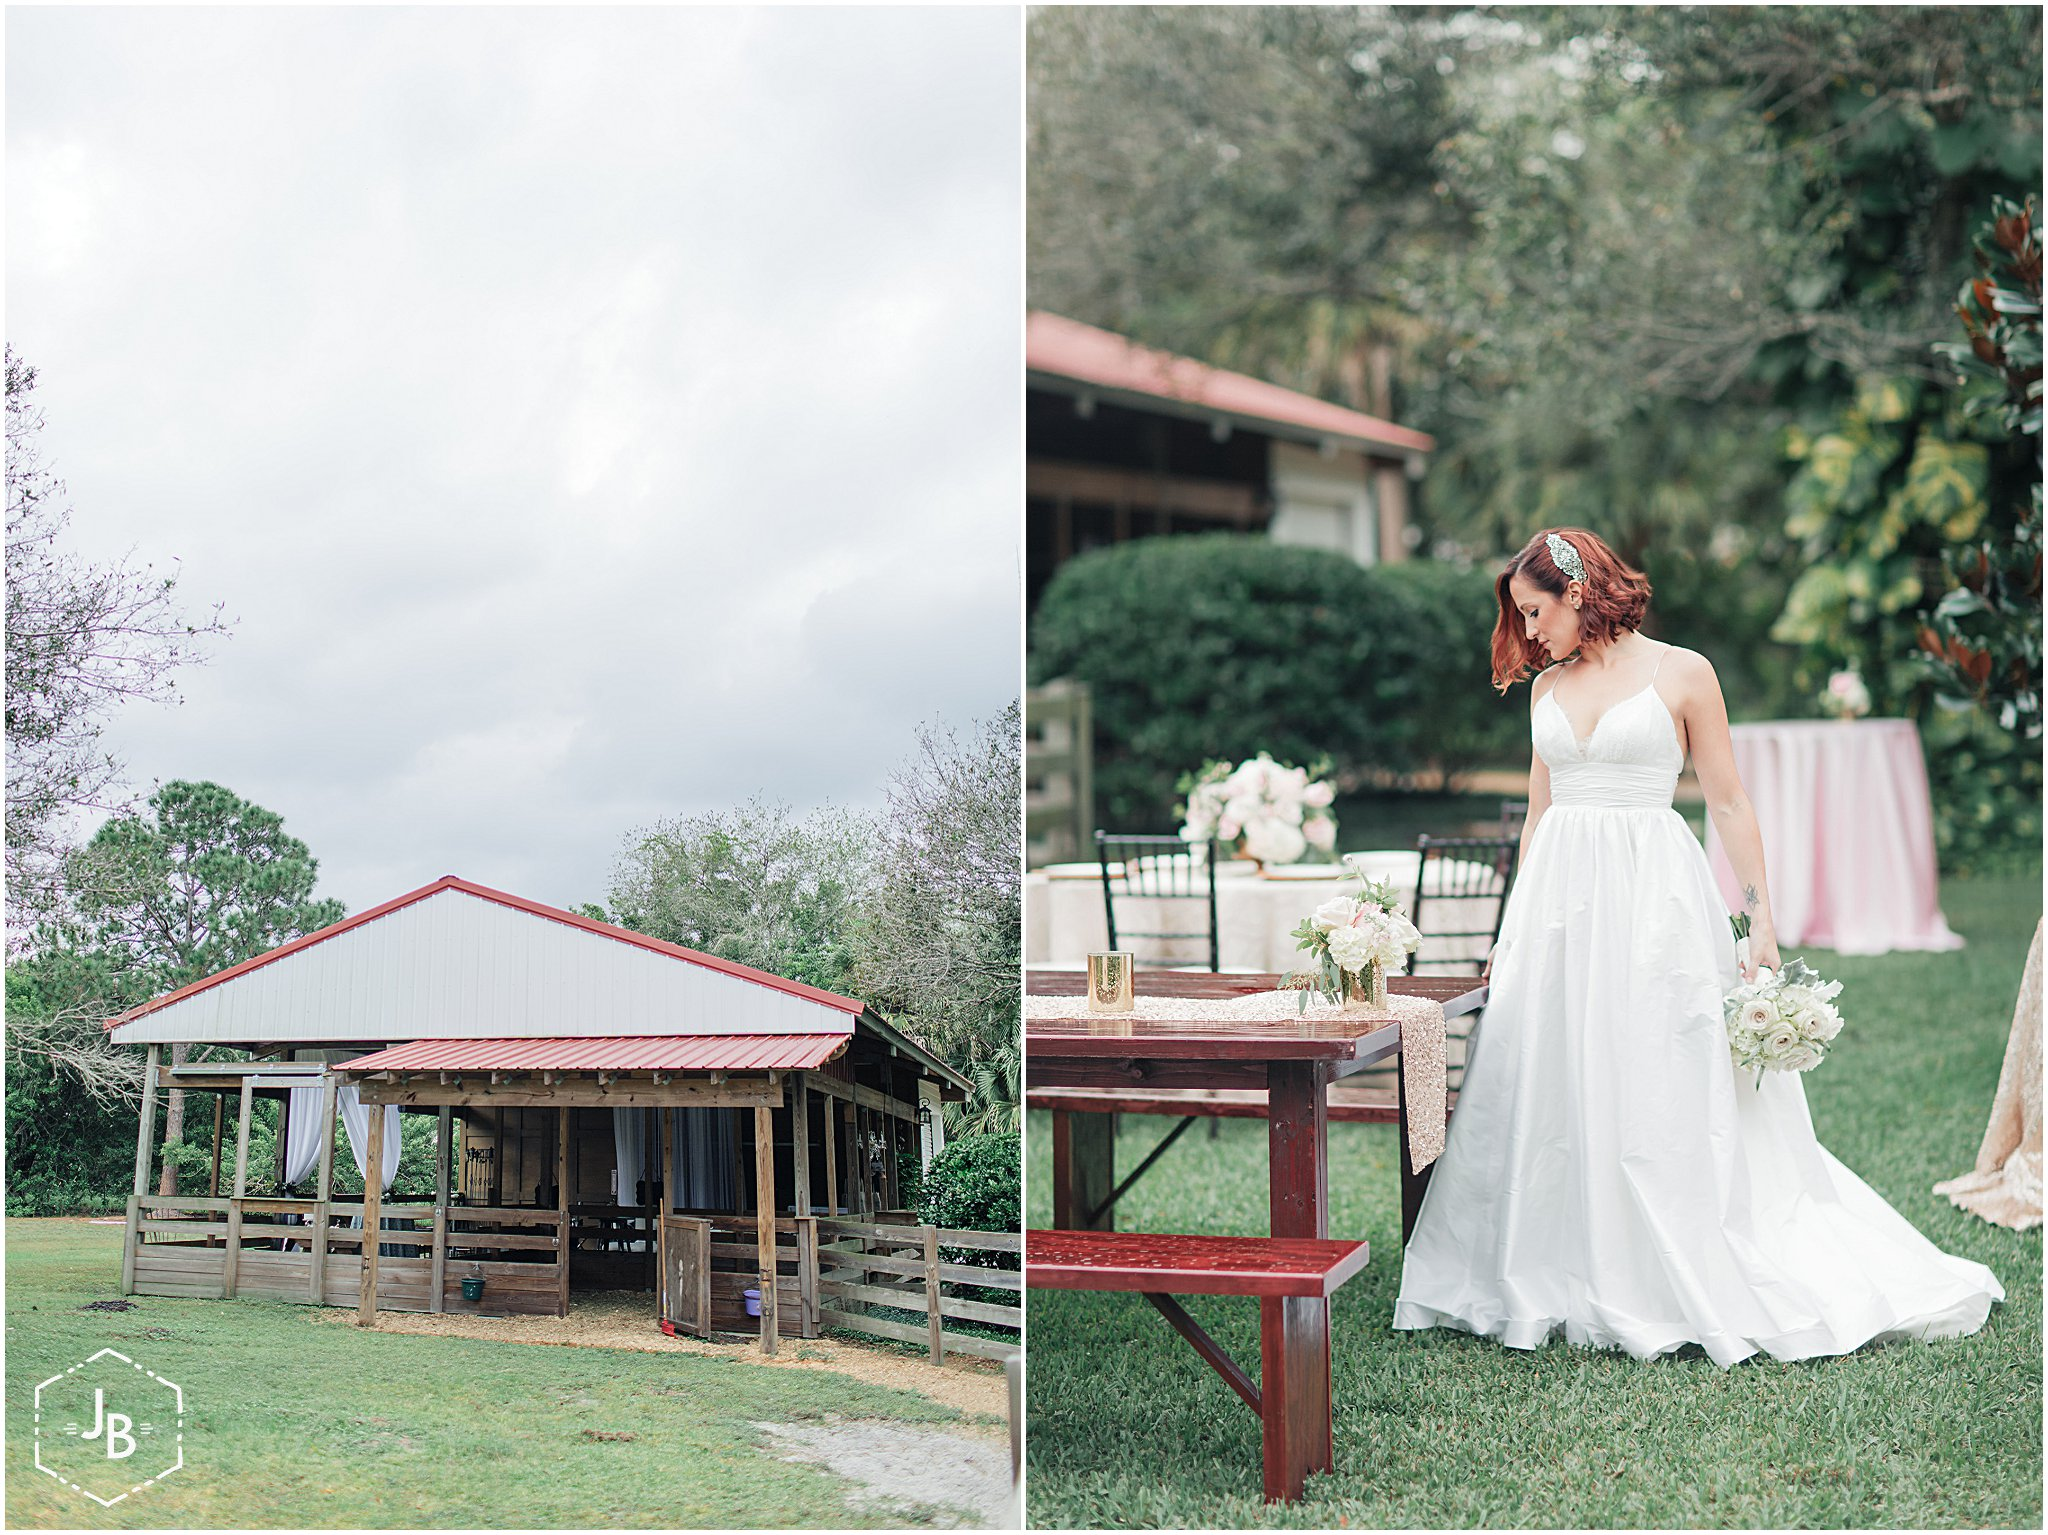 WeddingandEngagementFloridaPhotographer_0451.jpg